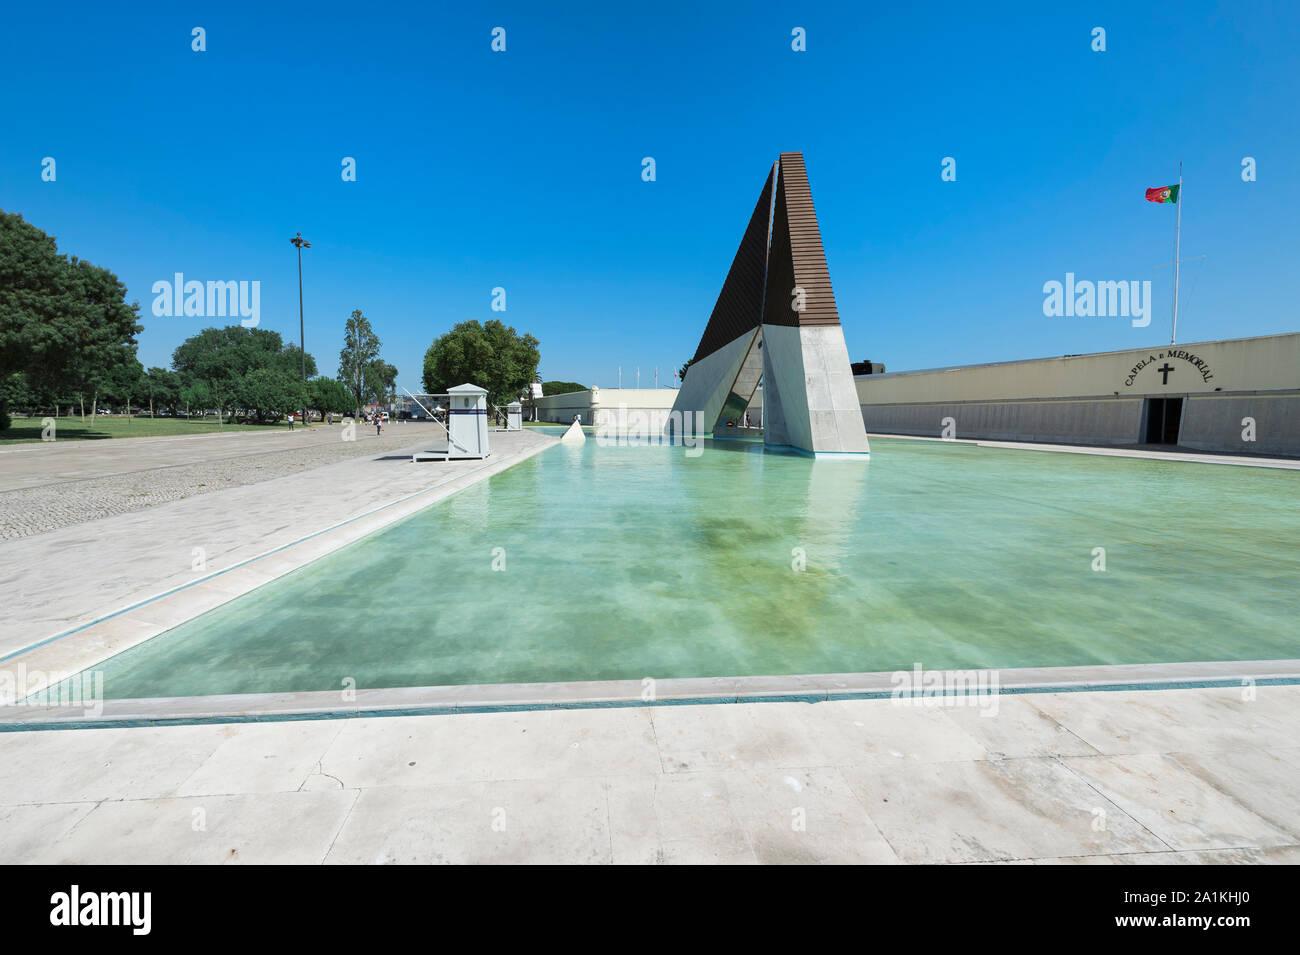 Belem War Memorial, Monumento aos Combatentes da Guerra do Ultramar, Belem, Lisbon, Portugal Stock Photo